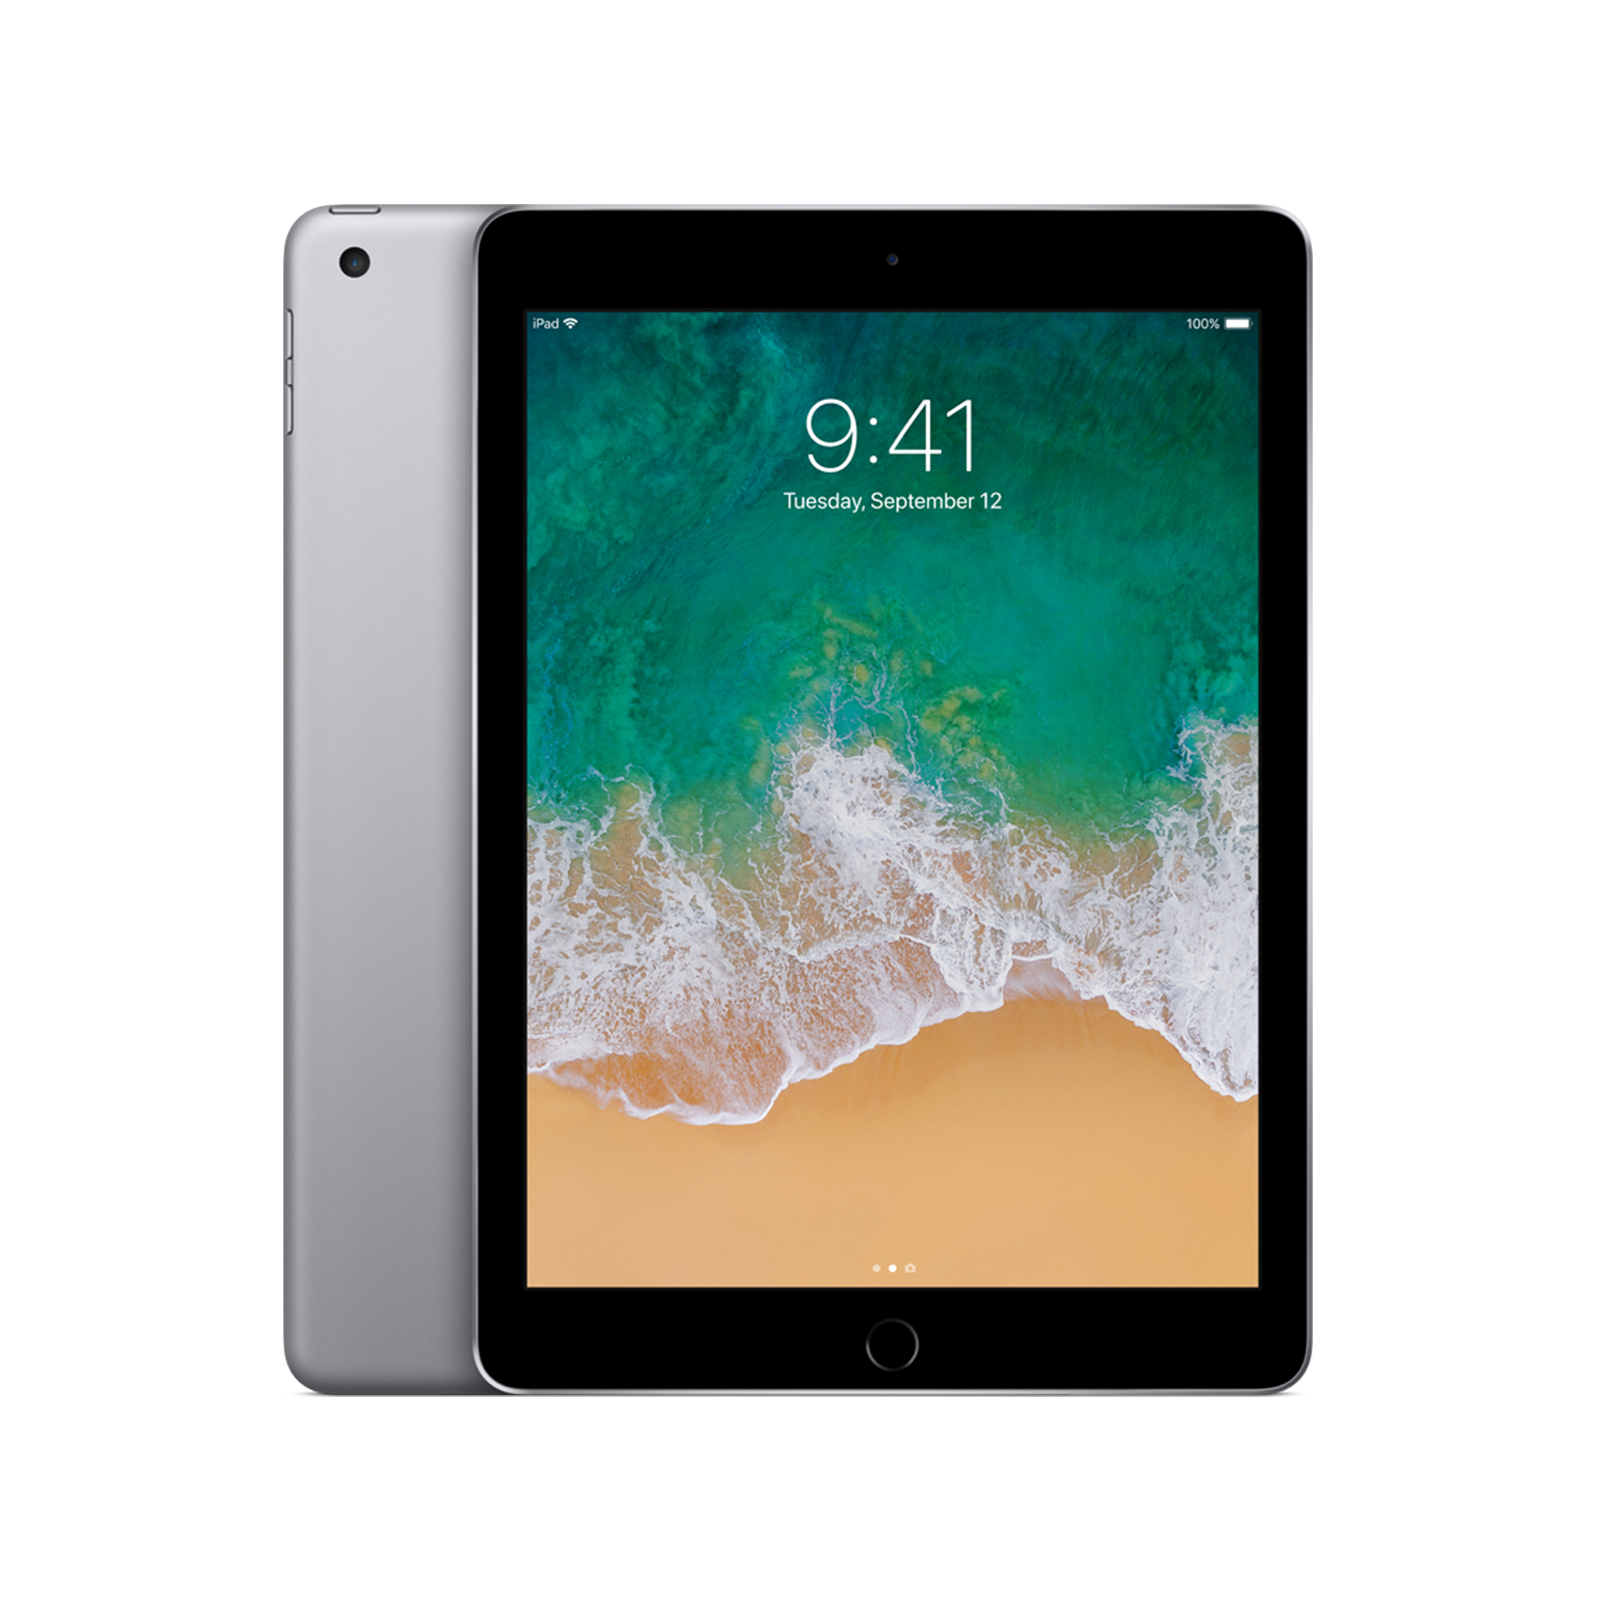 Apple iPad 5 - 32 GB - Space Gray - 4G